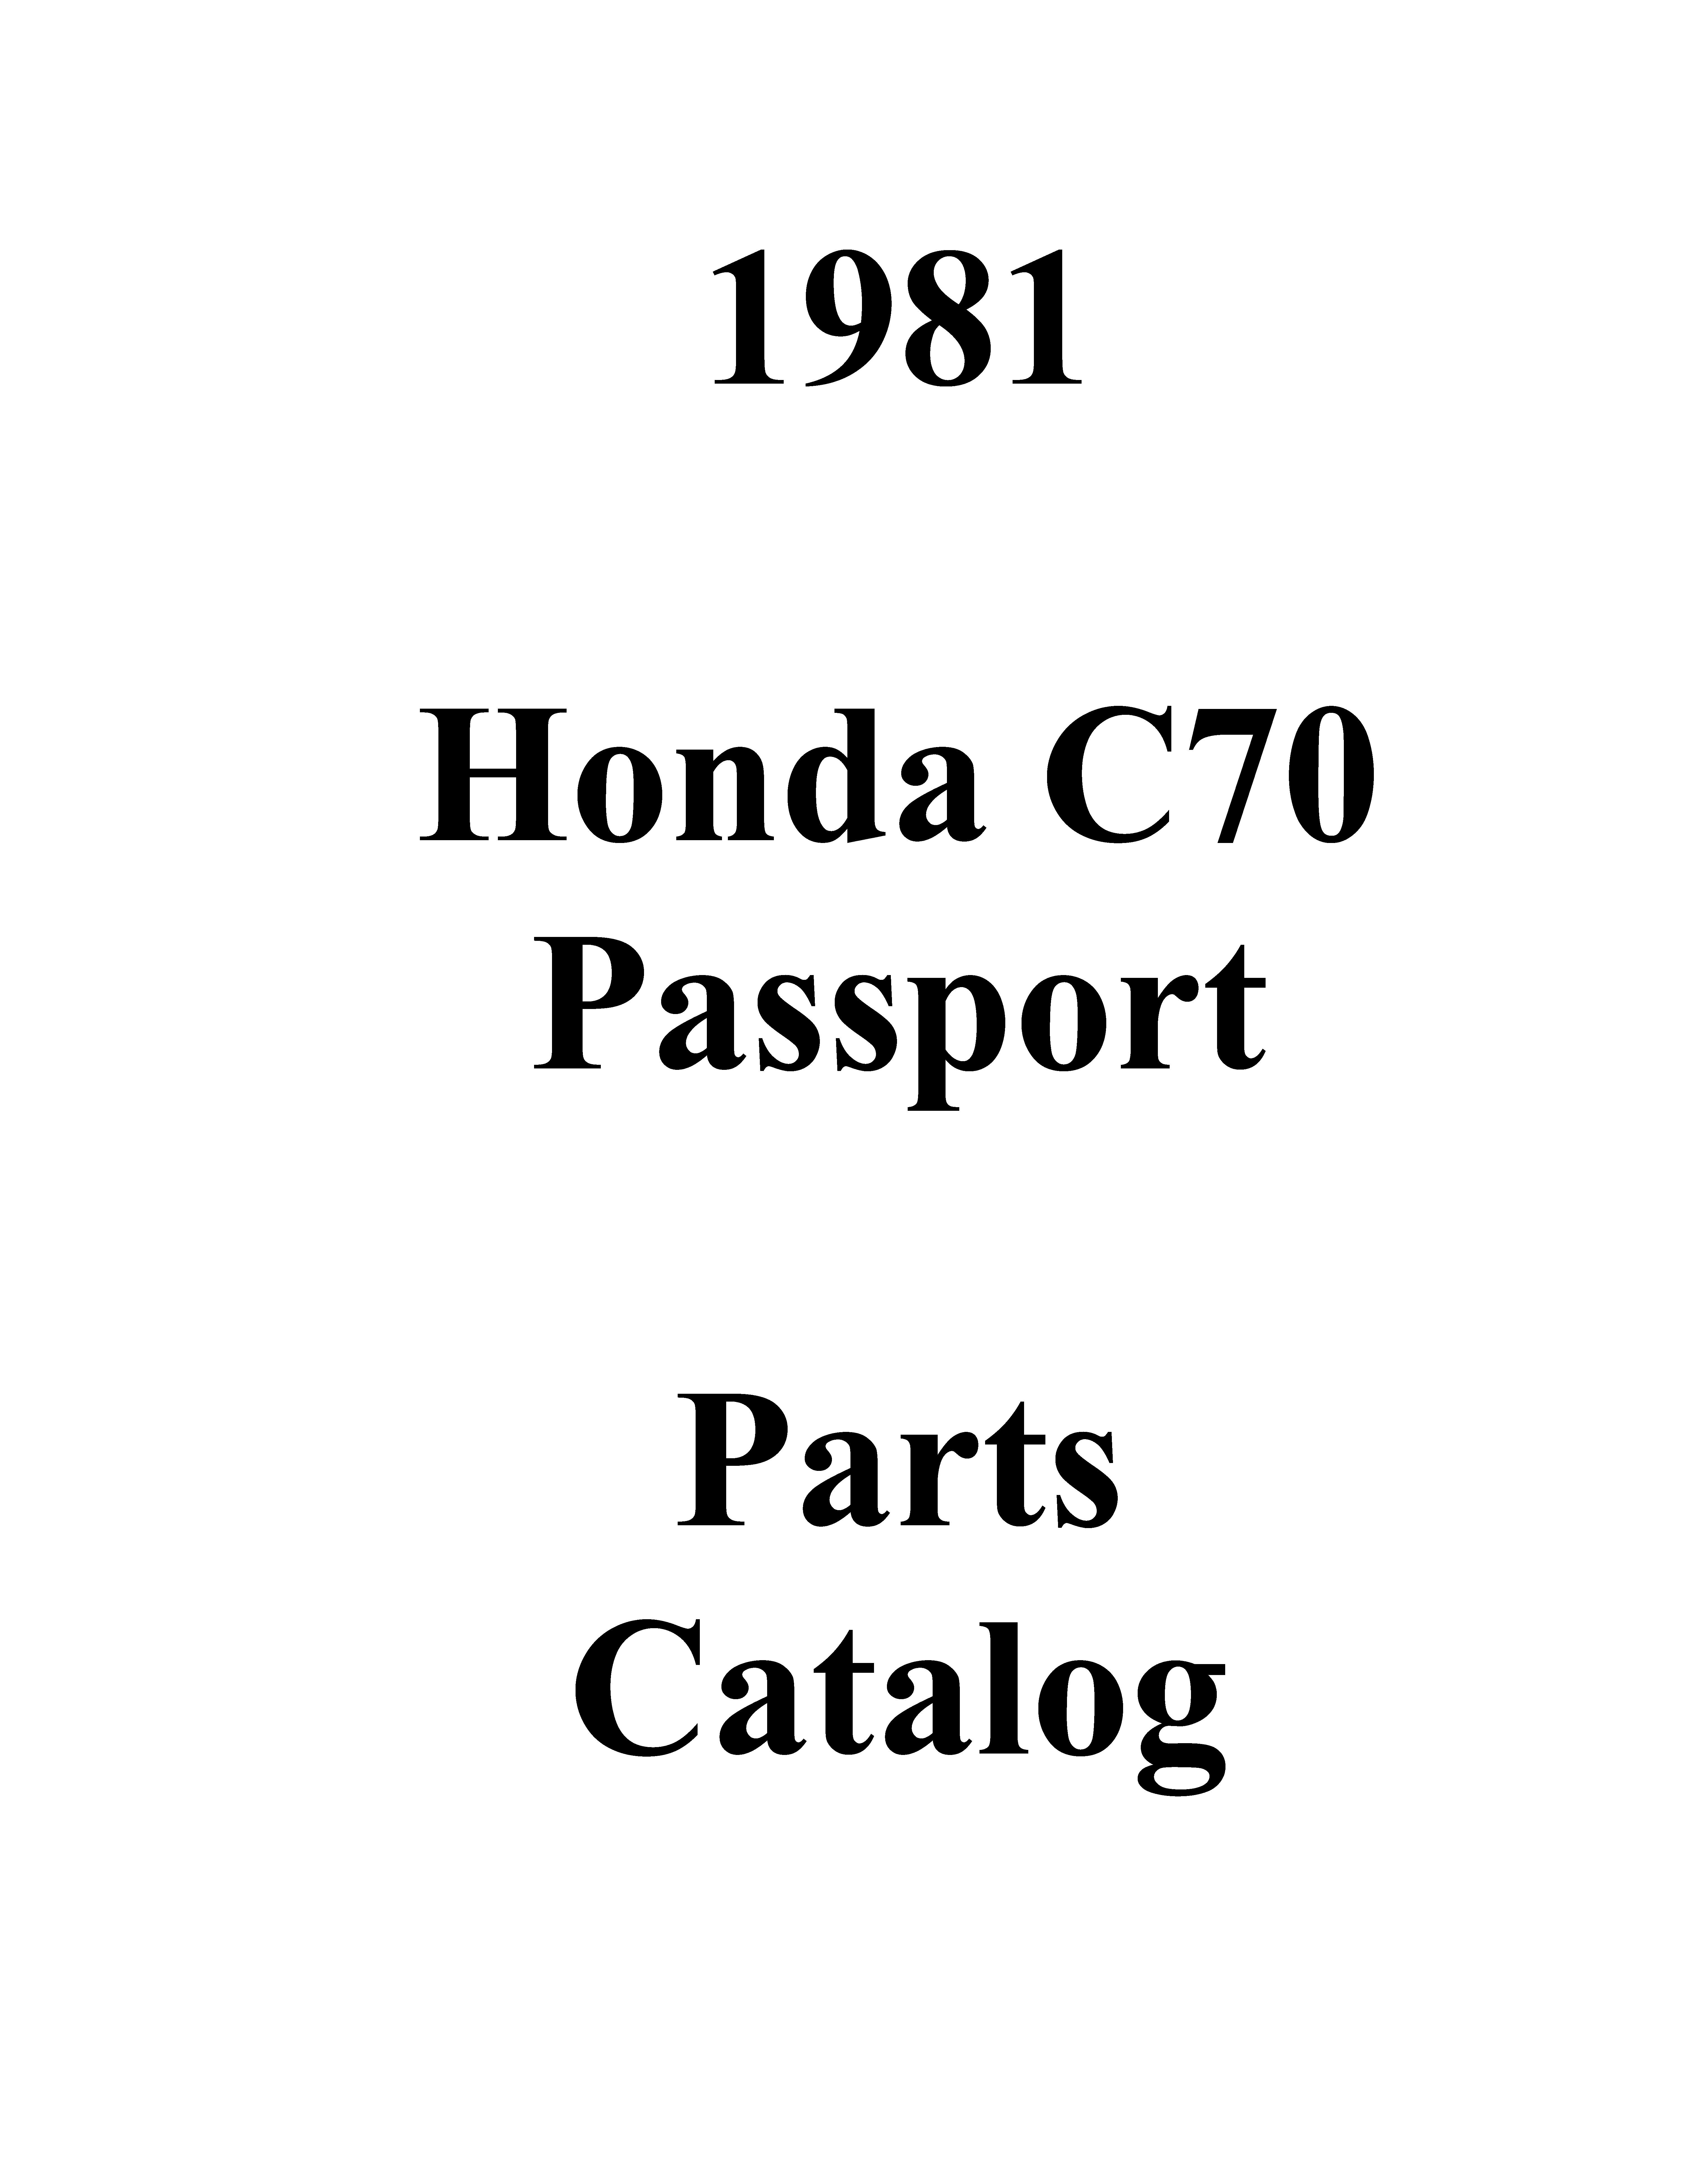 Parts List for Honda C70 (1981)